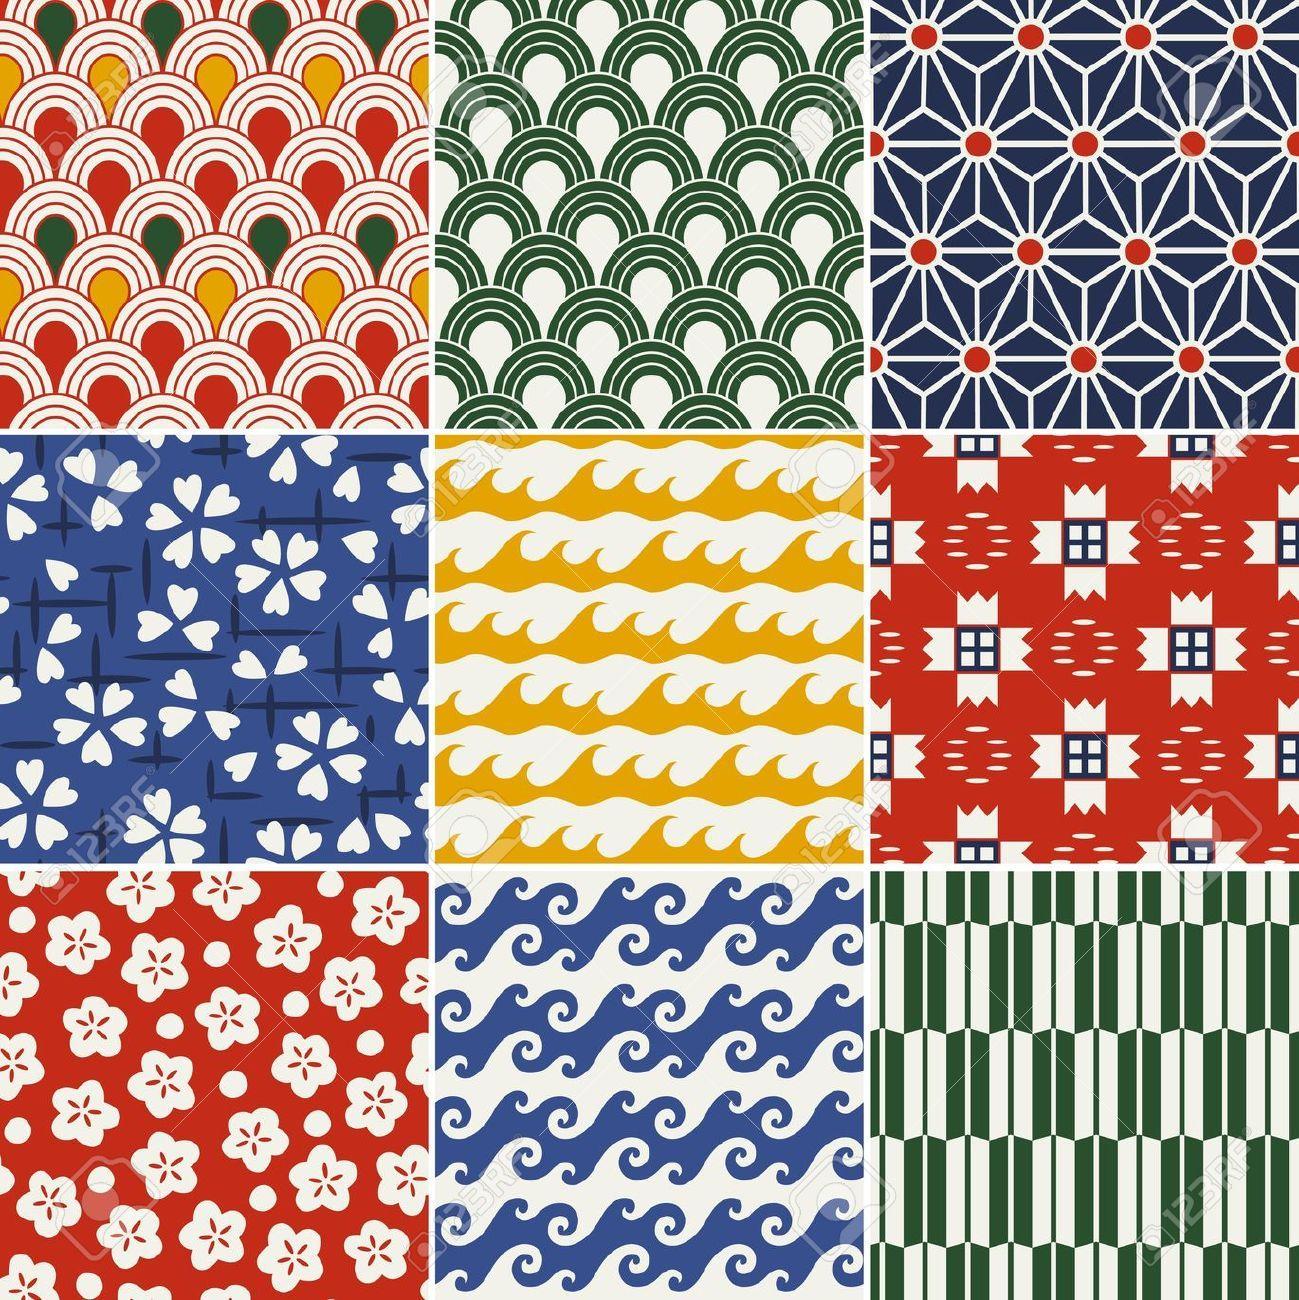 Seamless Japanese Kimono Pattern Royalty Free Cliparts, Vectors, And ...